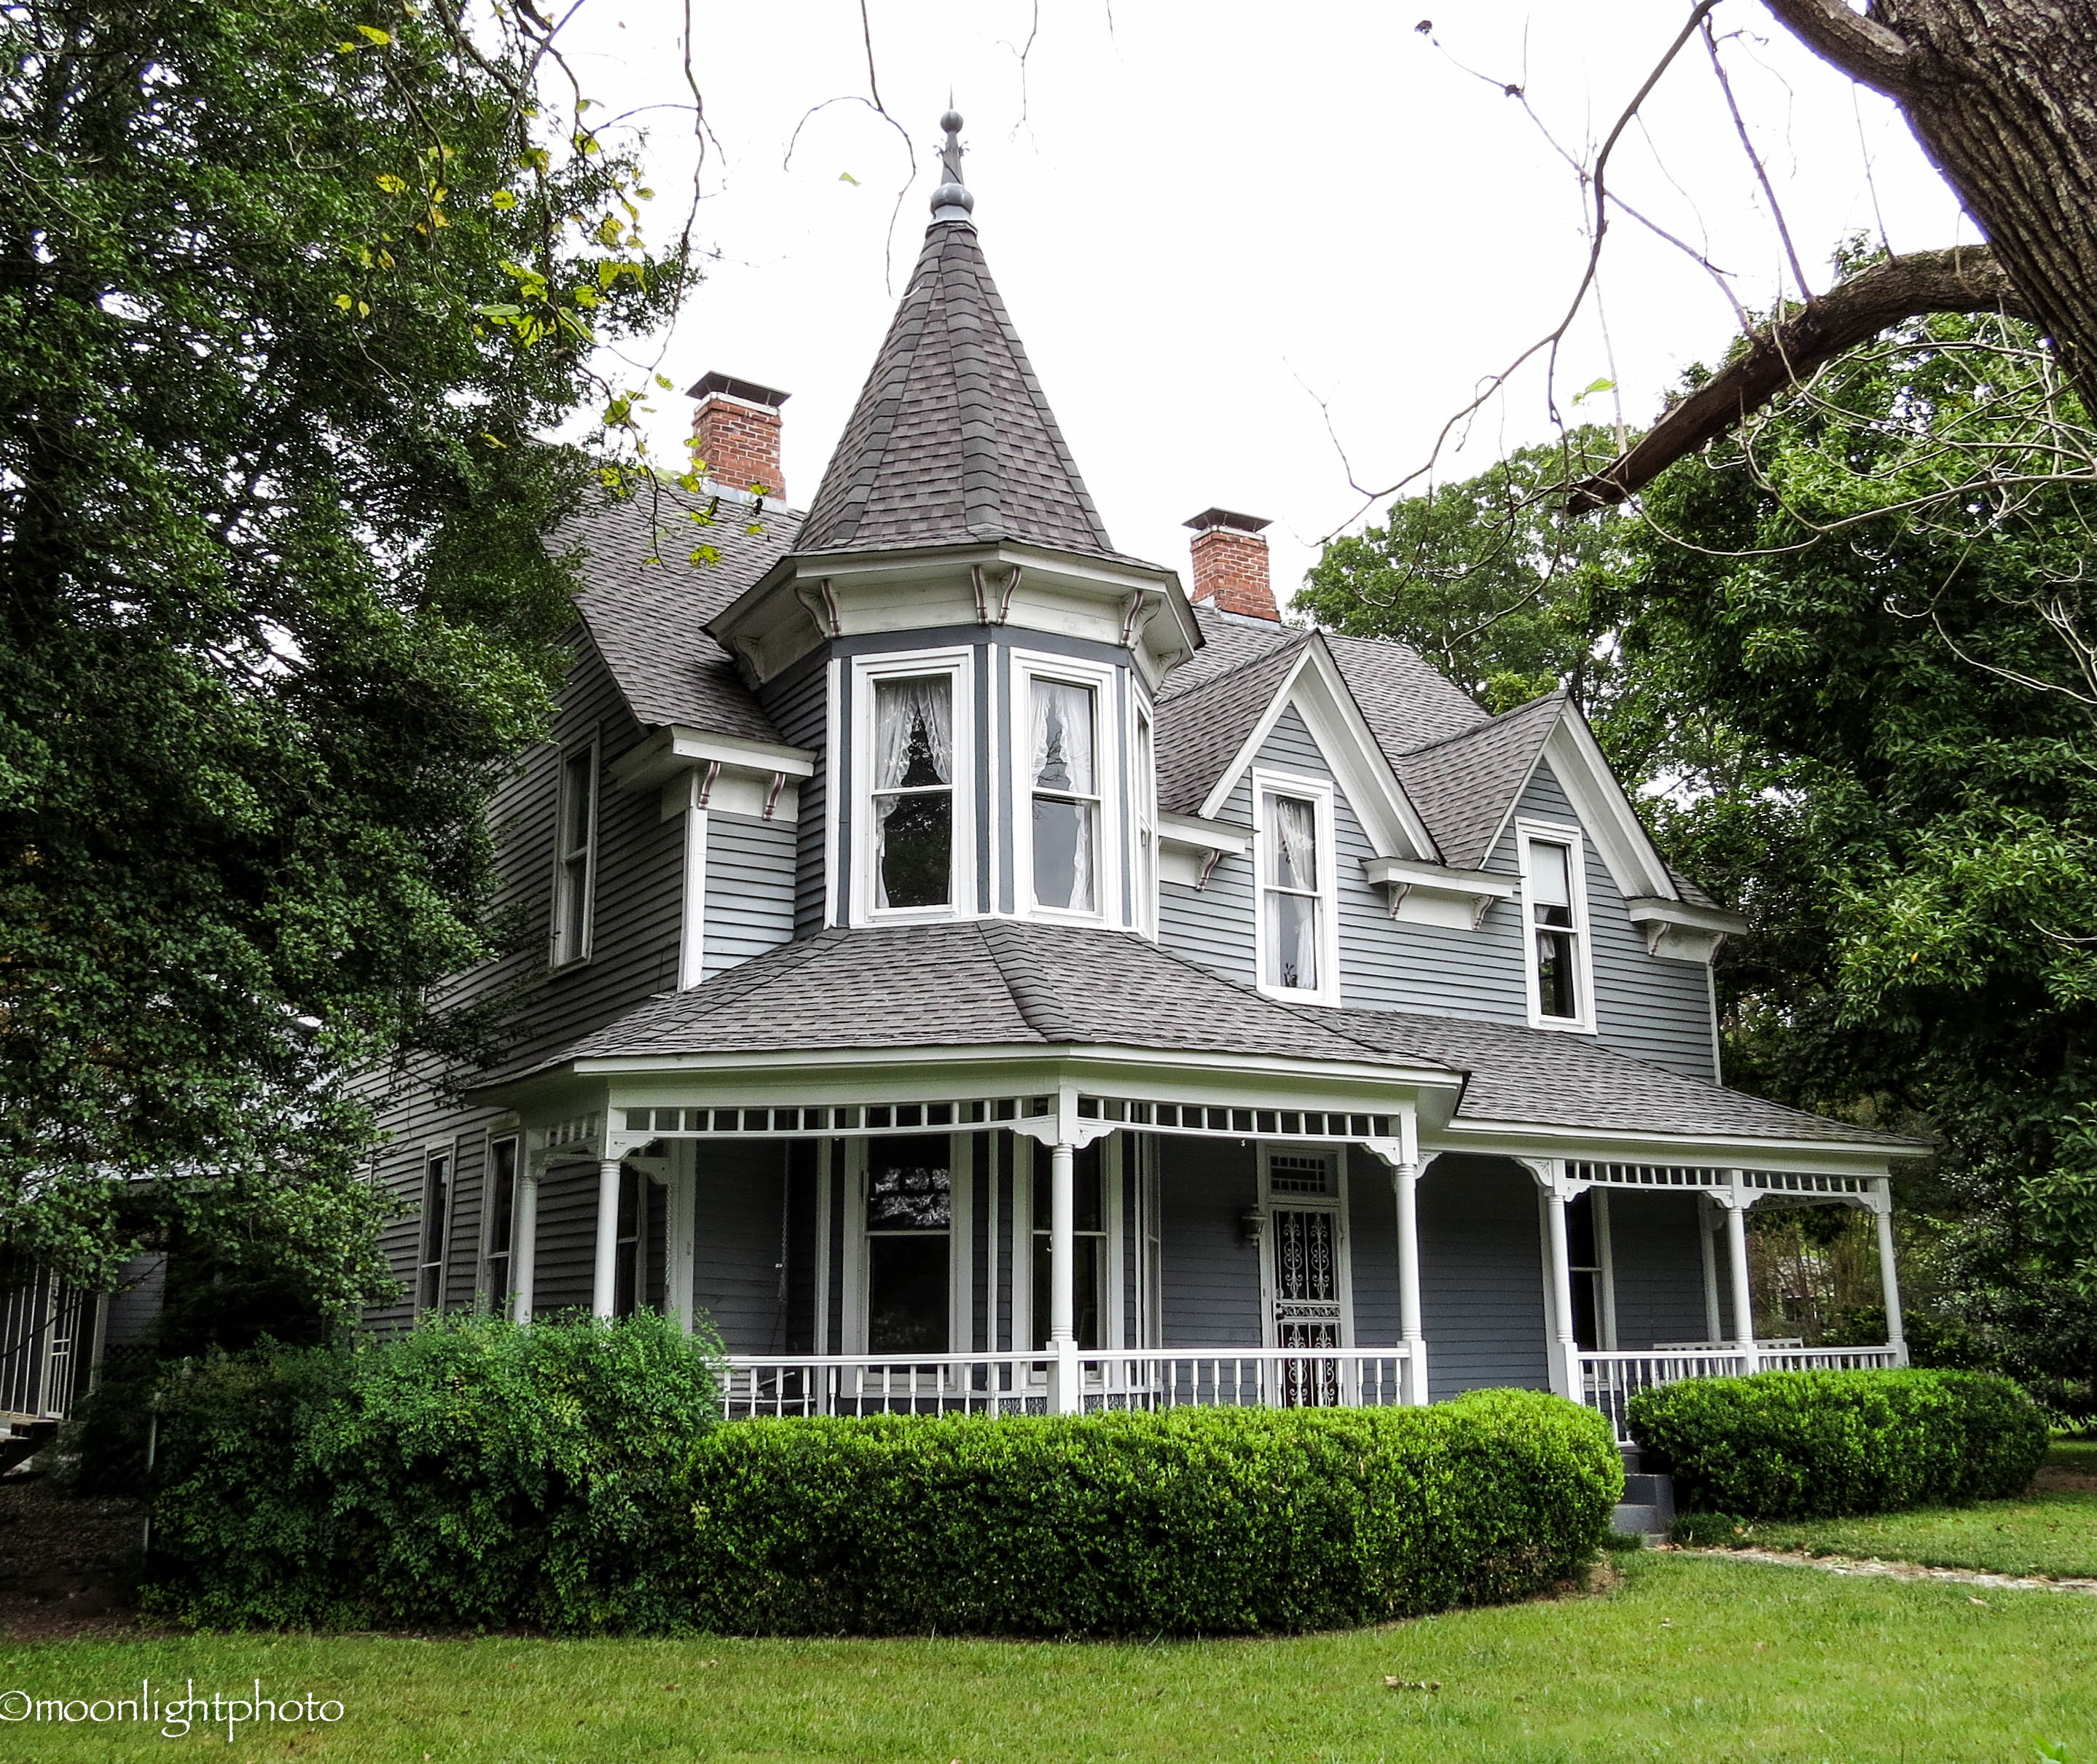 File:Blackford-Gray House 319 Gray St.jpg